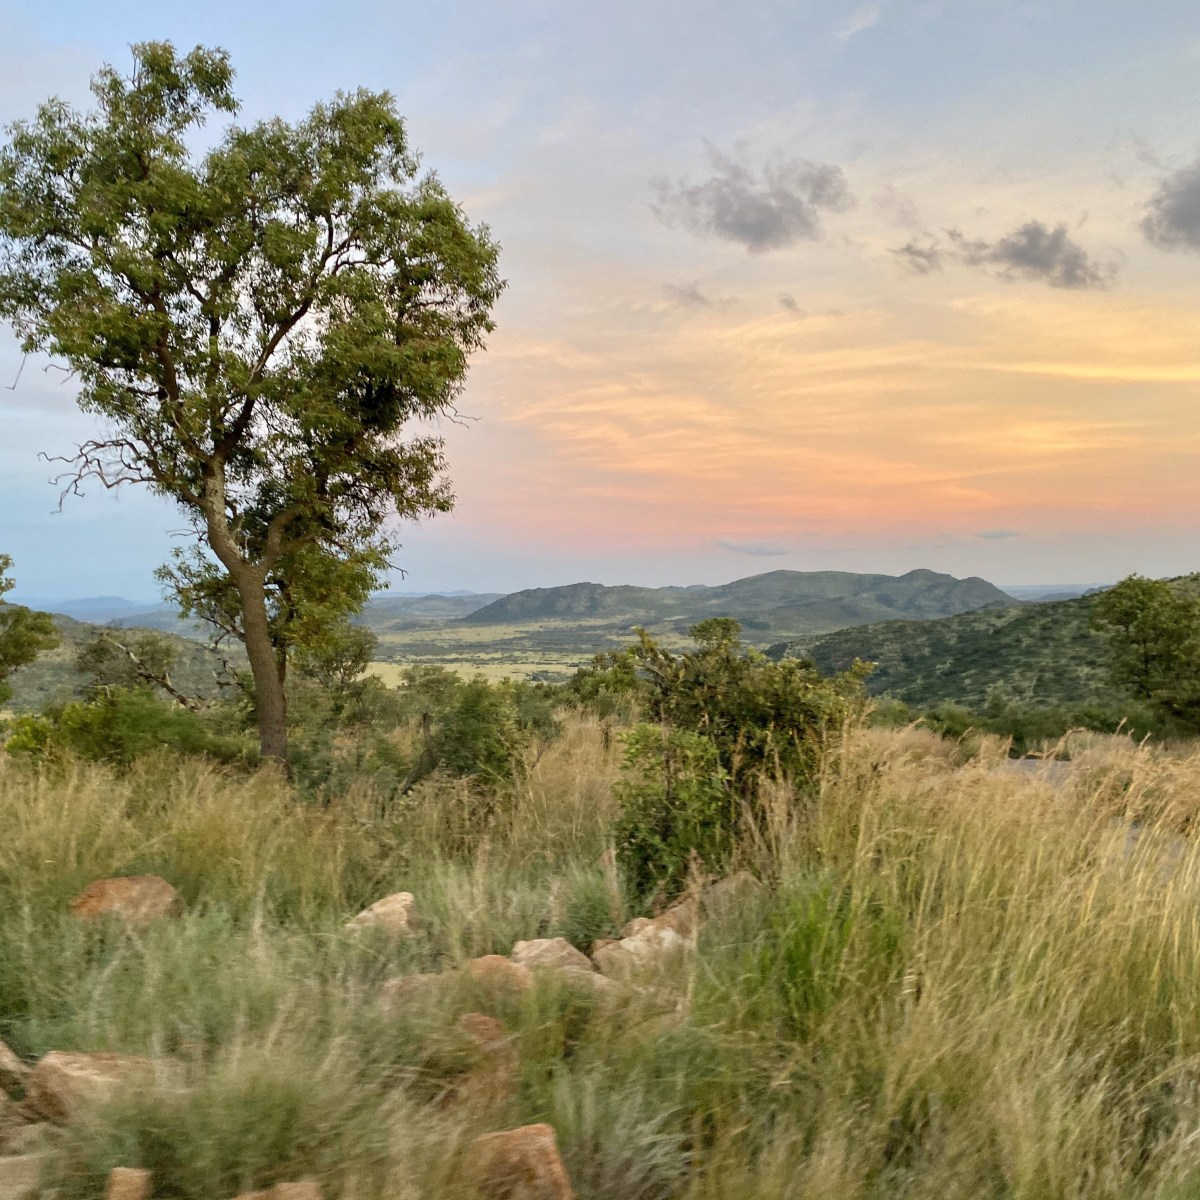 Skyline at Pilanesberg National Park